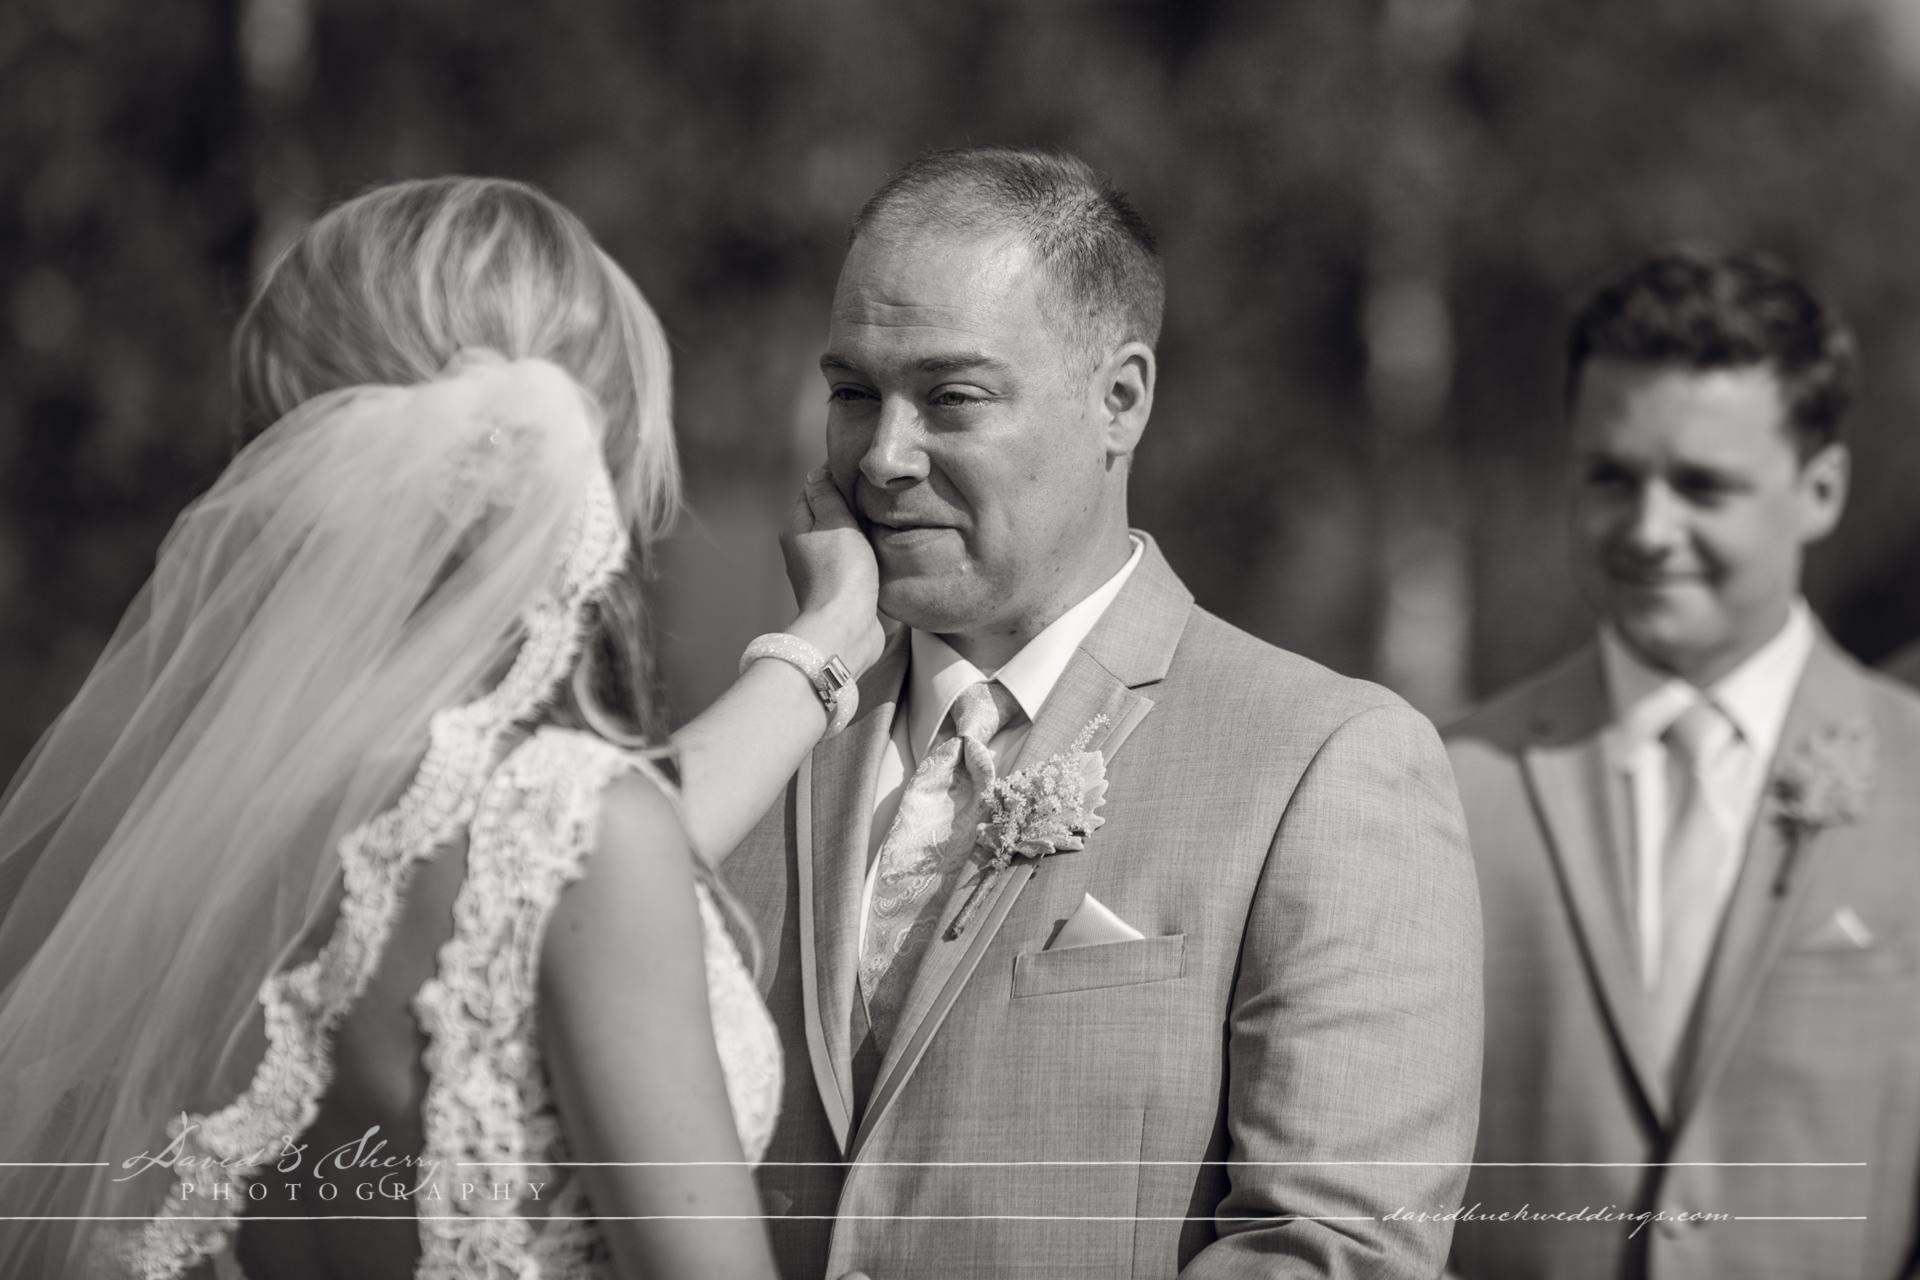 Cobble_Beach_Wedding_Photography_Owen_Sound_21